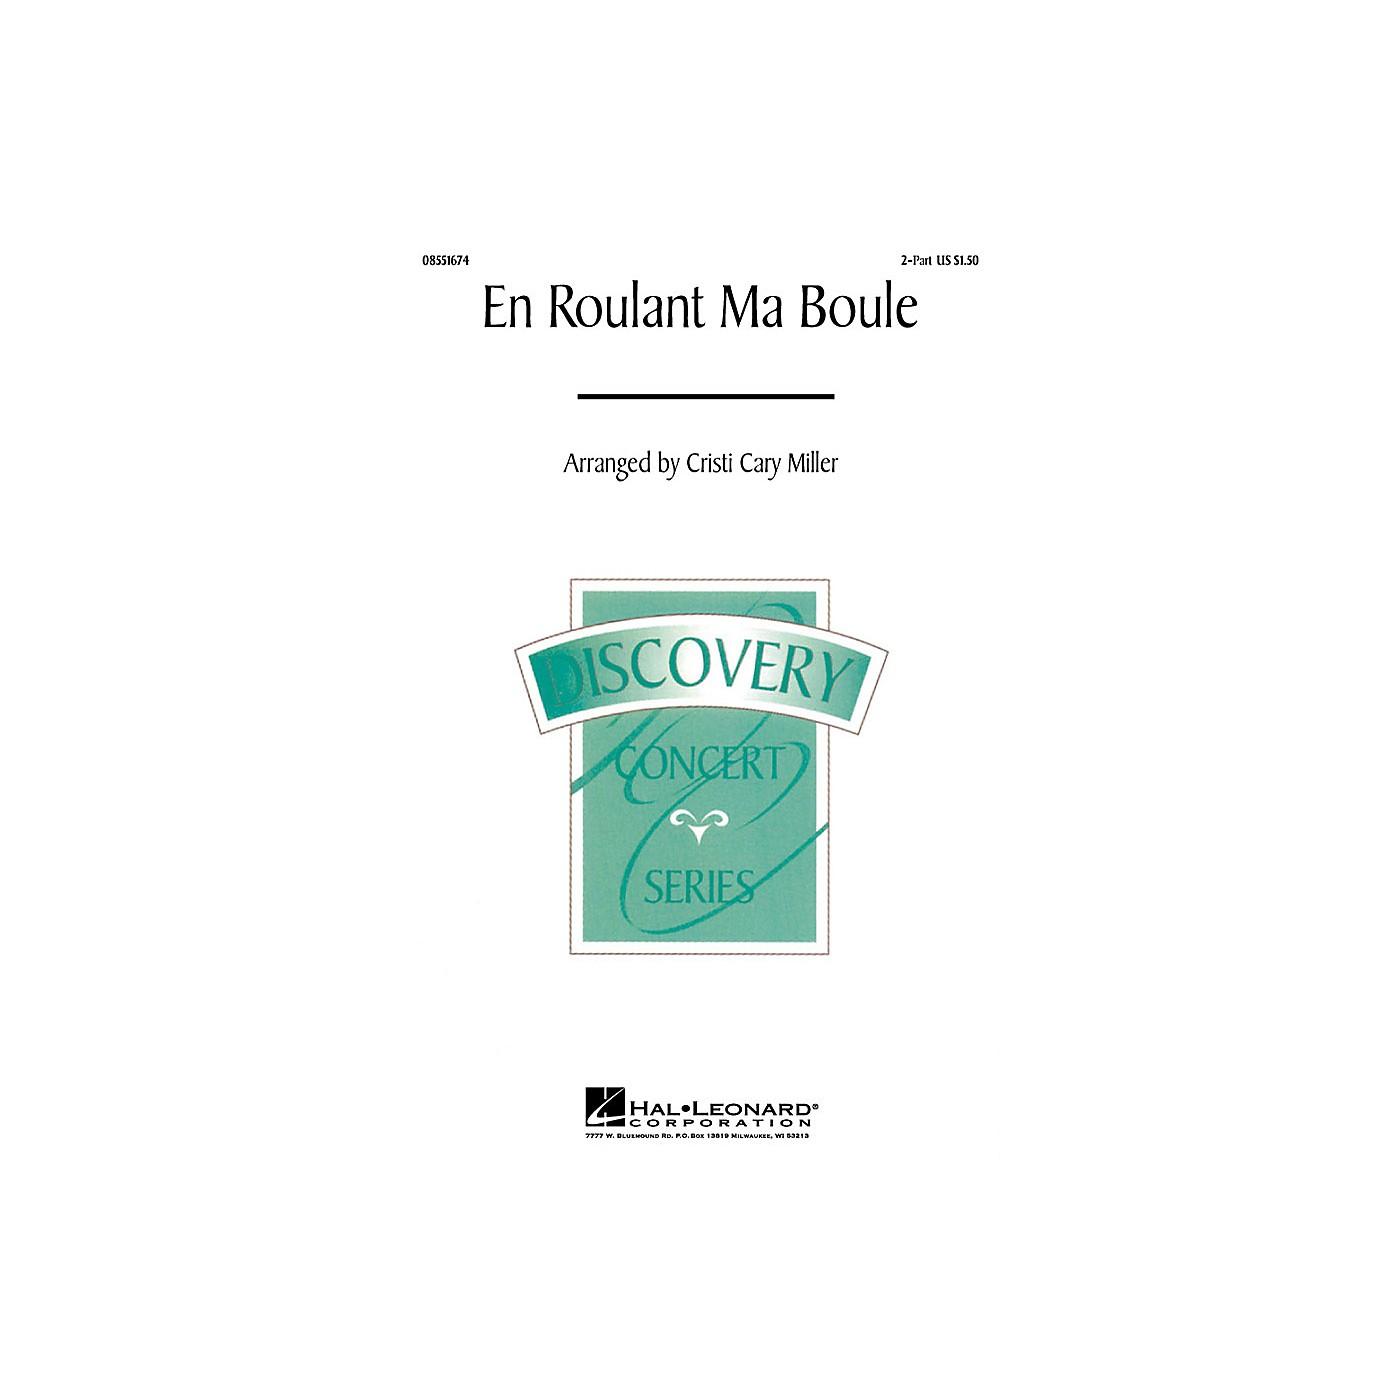 Hal Leonard En Roulant ma Boule 2-Part arranged by Cristi Cary Miller thumbnail